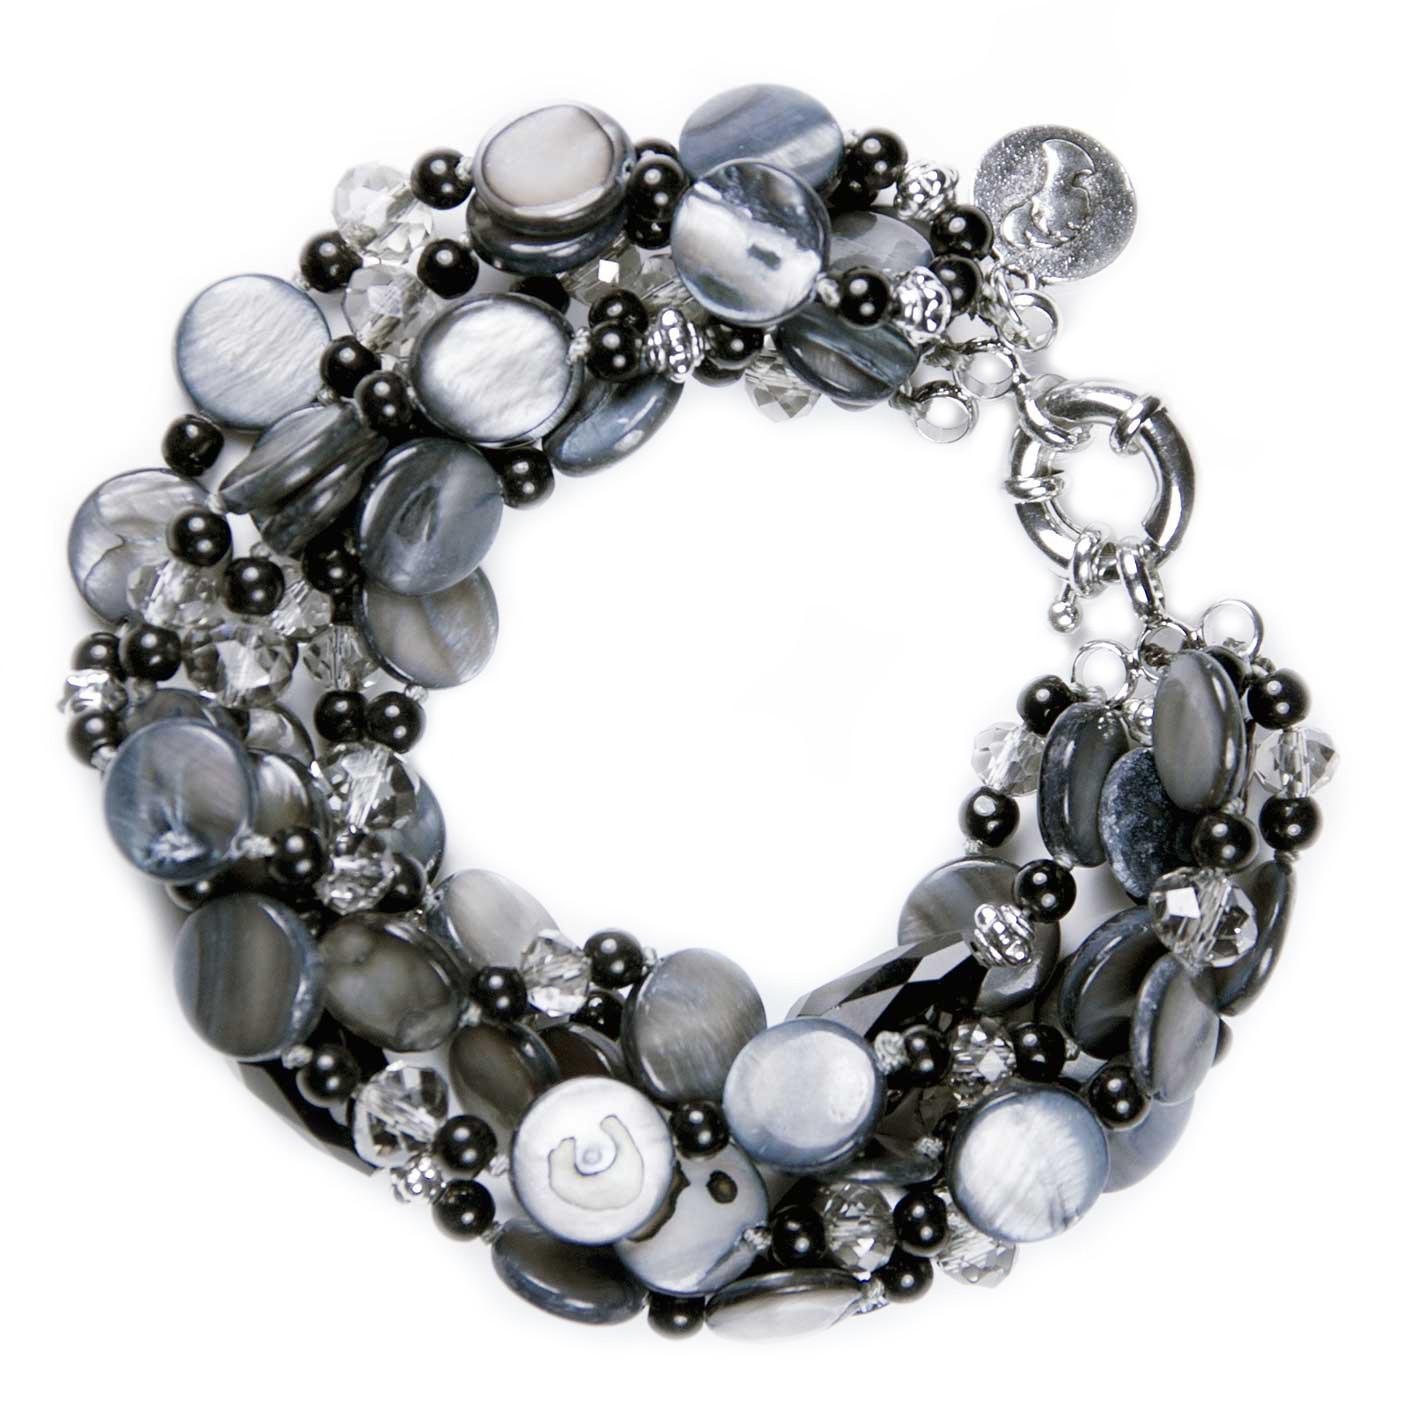 Swarovski Crystal 6 Stranded Light BlackNavy Shell Beads